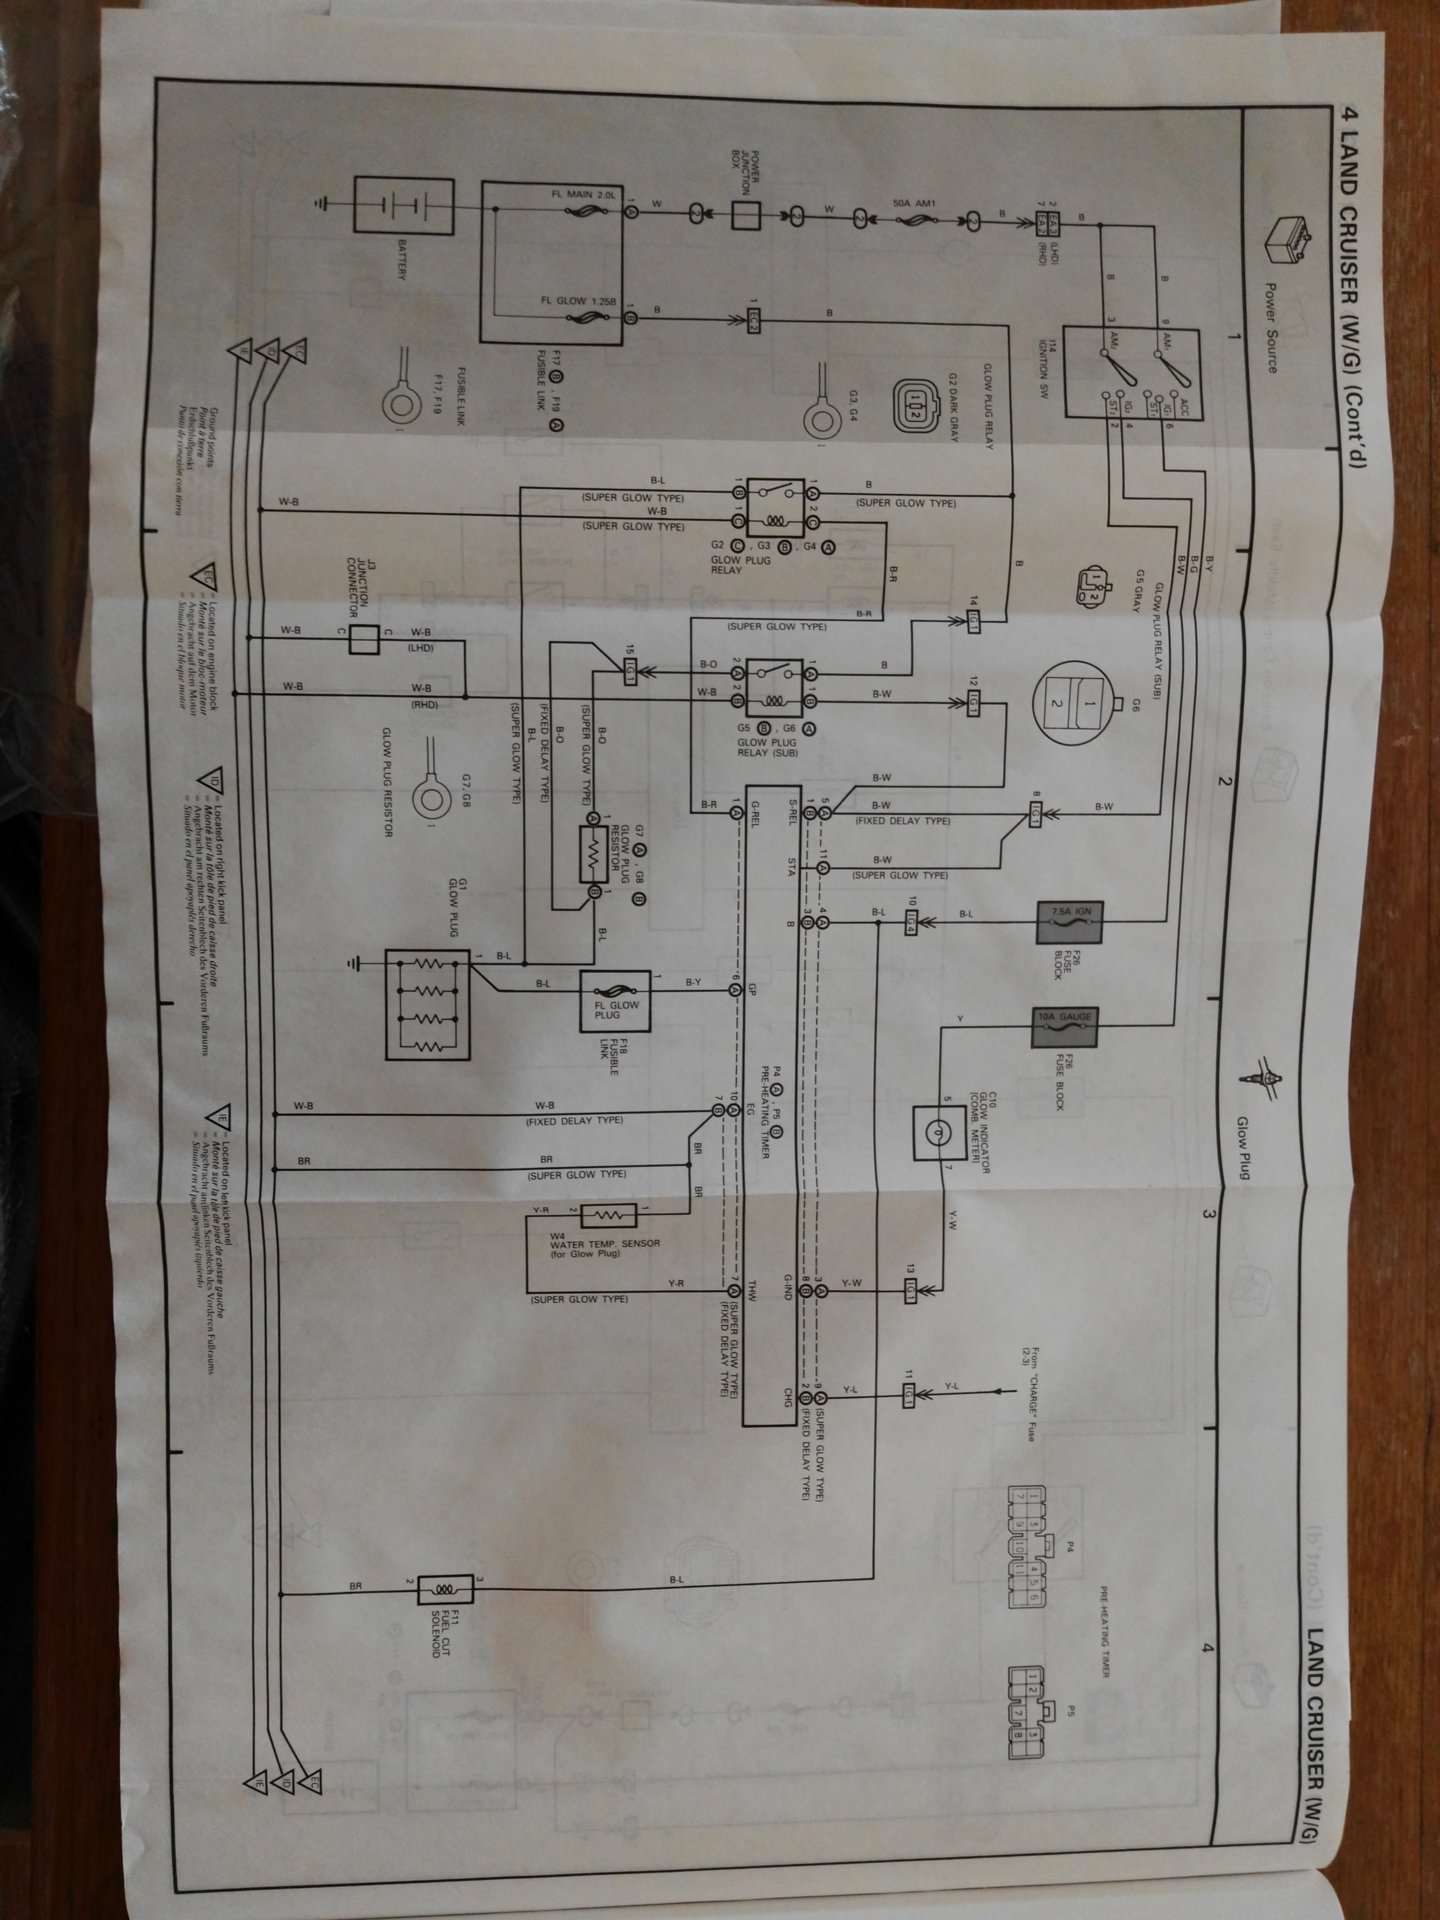 Plug Ignition Wiring Diagram Get Free Image About Wiring Diagram